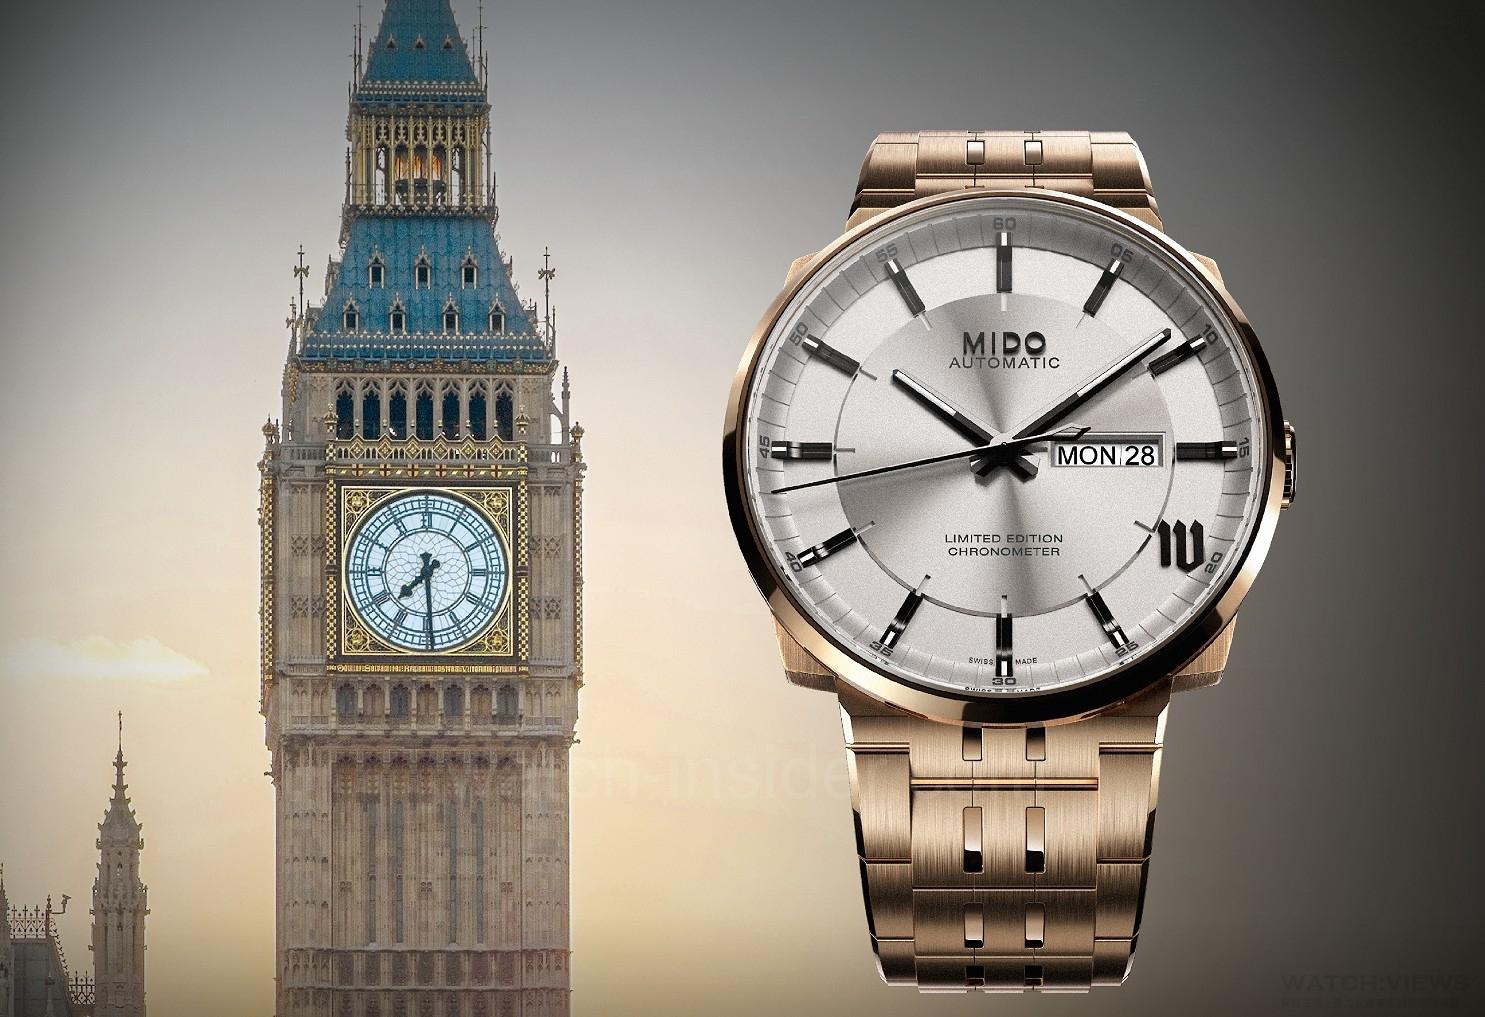 【2016 BASEL巴塞爾錶展報導】美度MIDO全新Big Ben英國倫敦大笨鐘限量腕錶